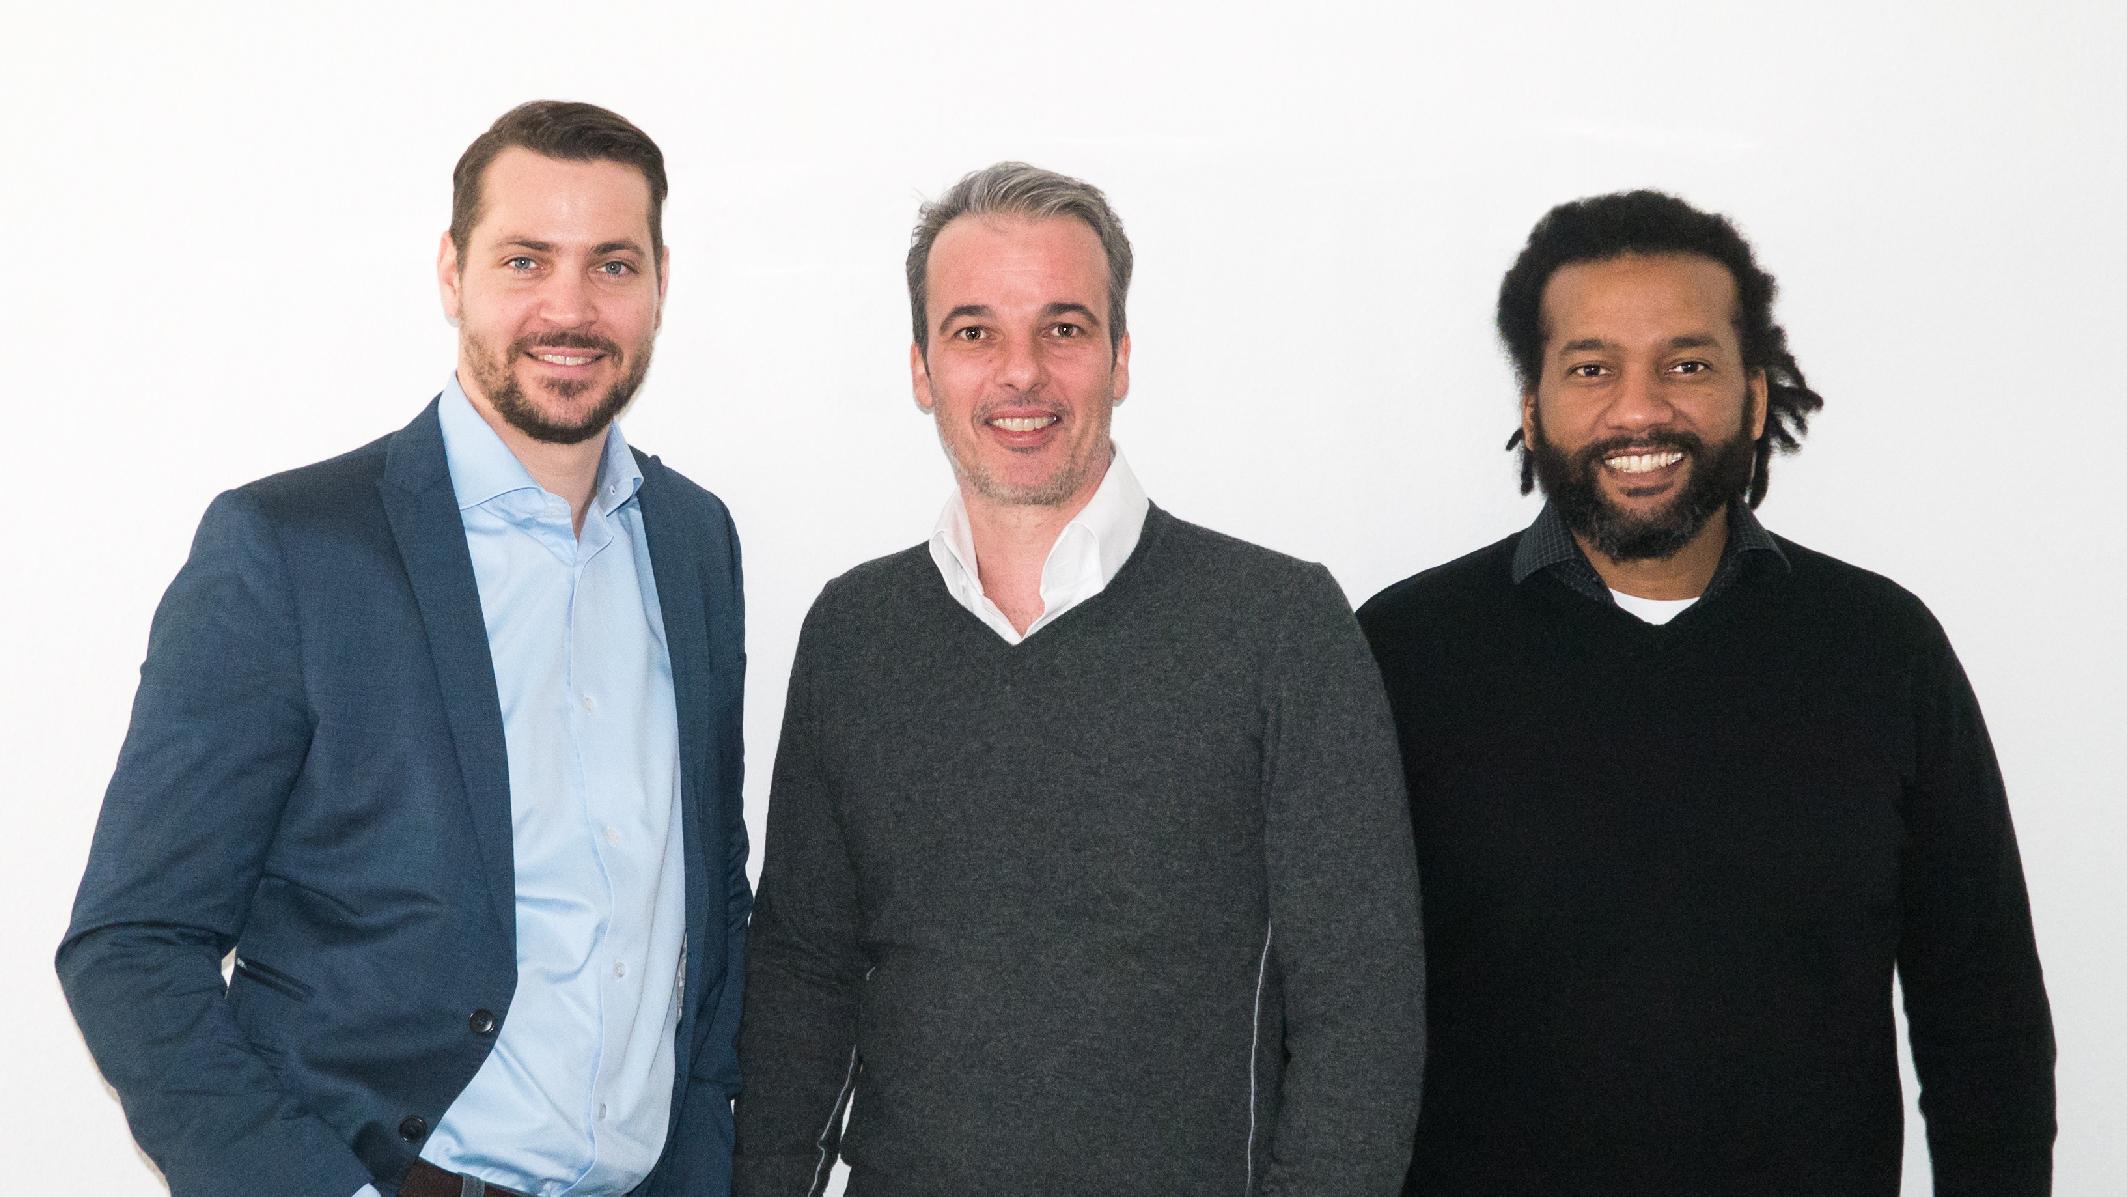 Gruender iduwi v.l.n.r. Christian Kaldewei, Stefan Frei, Alain Yimbou